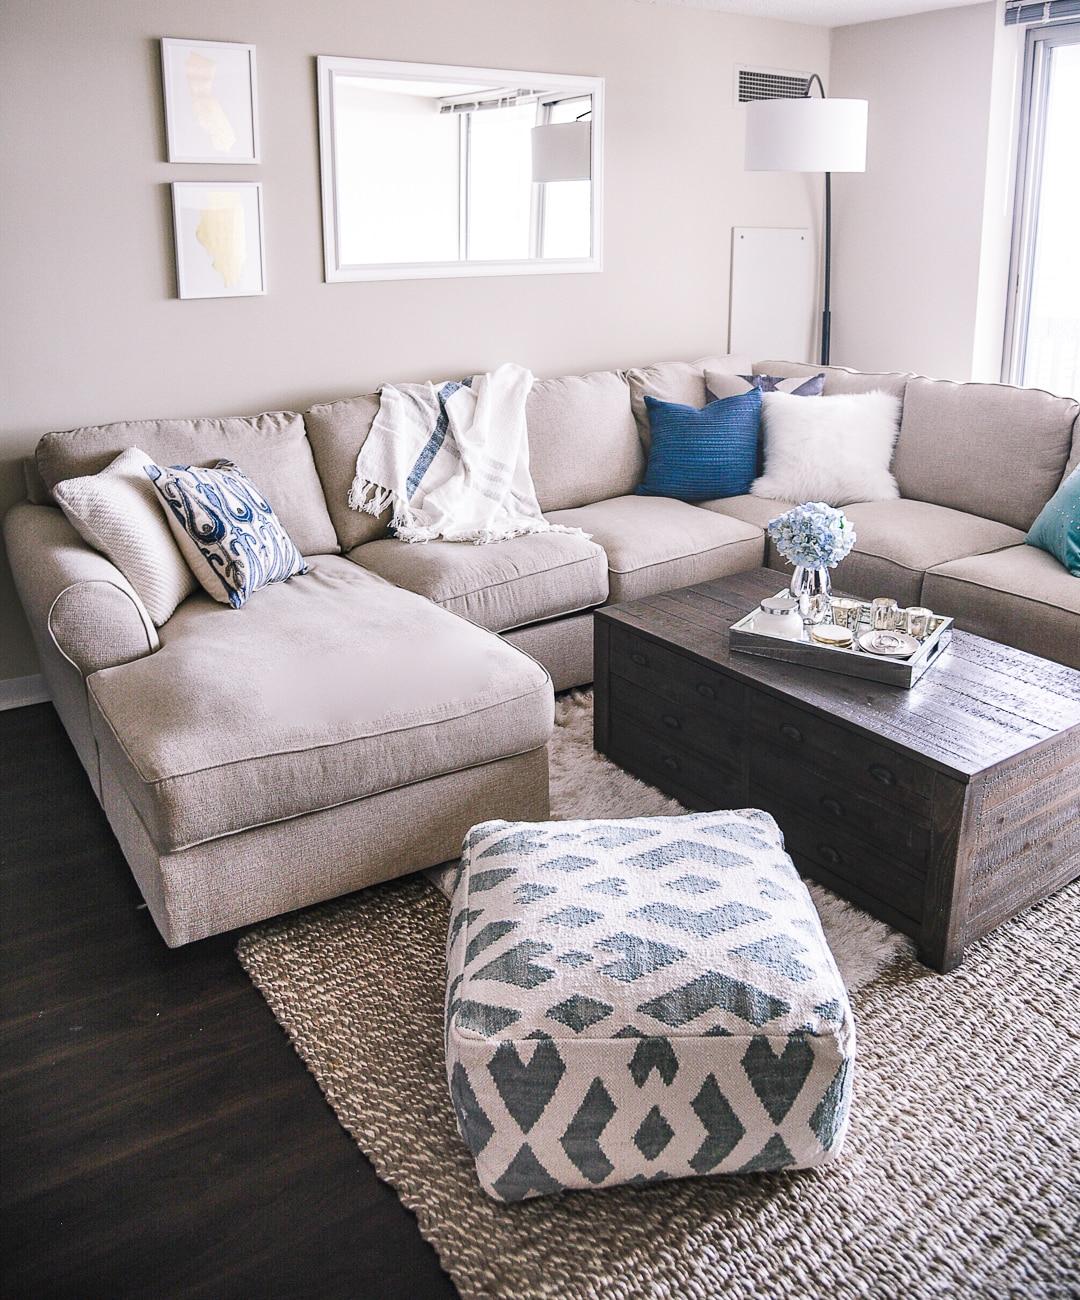 Spring Living Room Refresh With Jenna Colgrove - XO Ashley